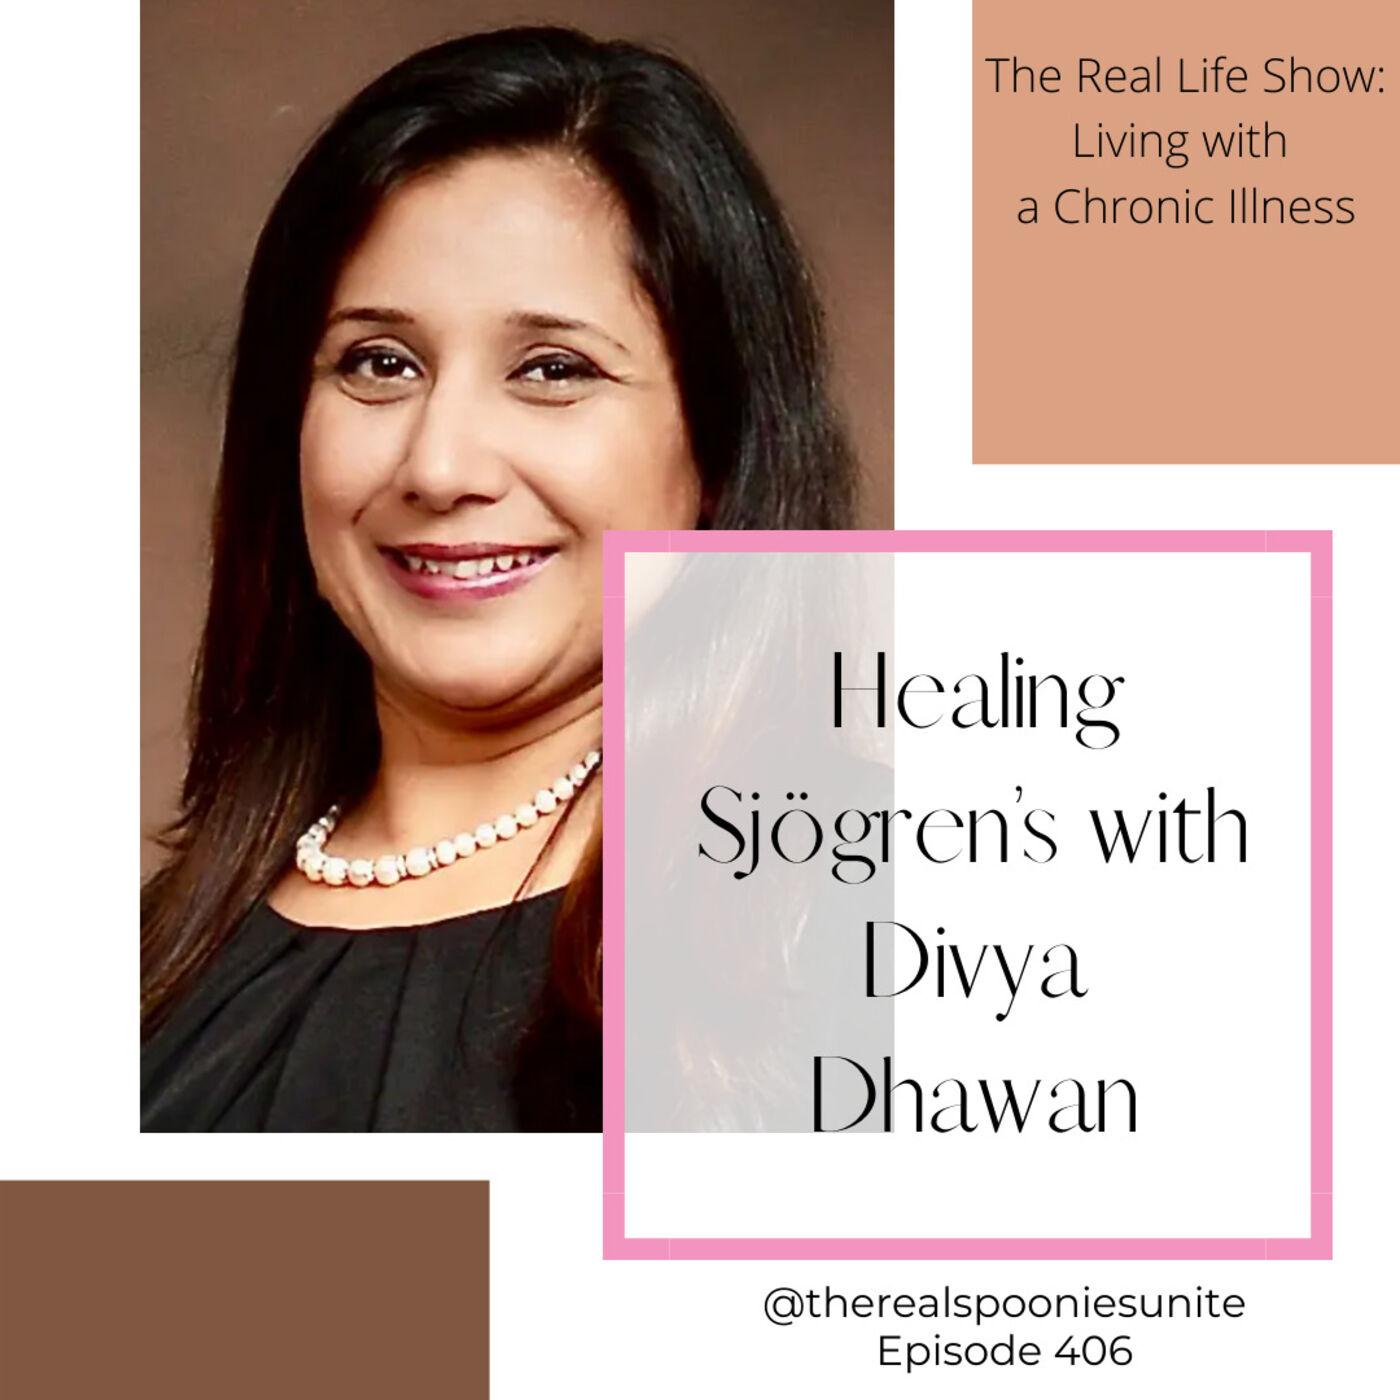 Healing Sjögren's with Divya Dhawan